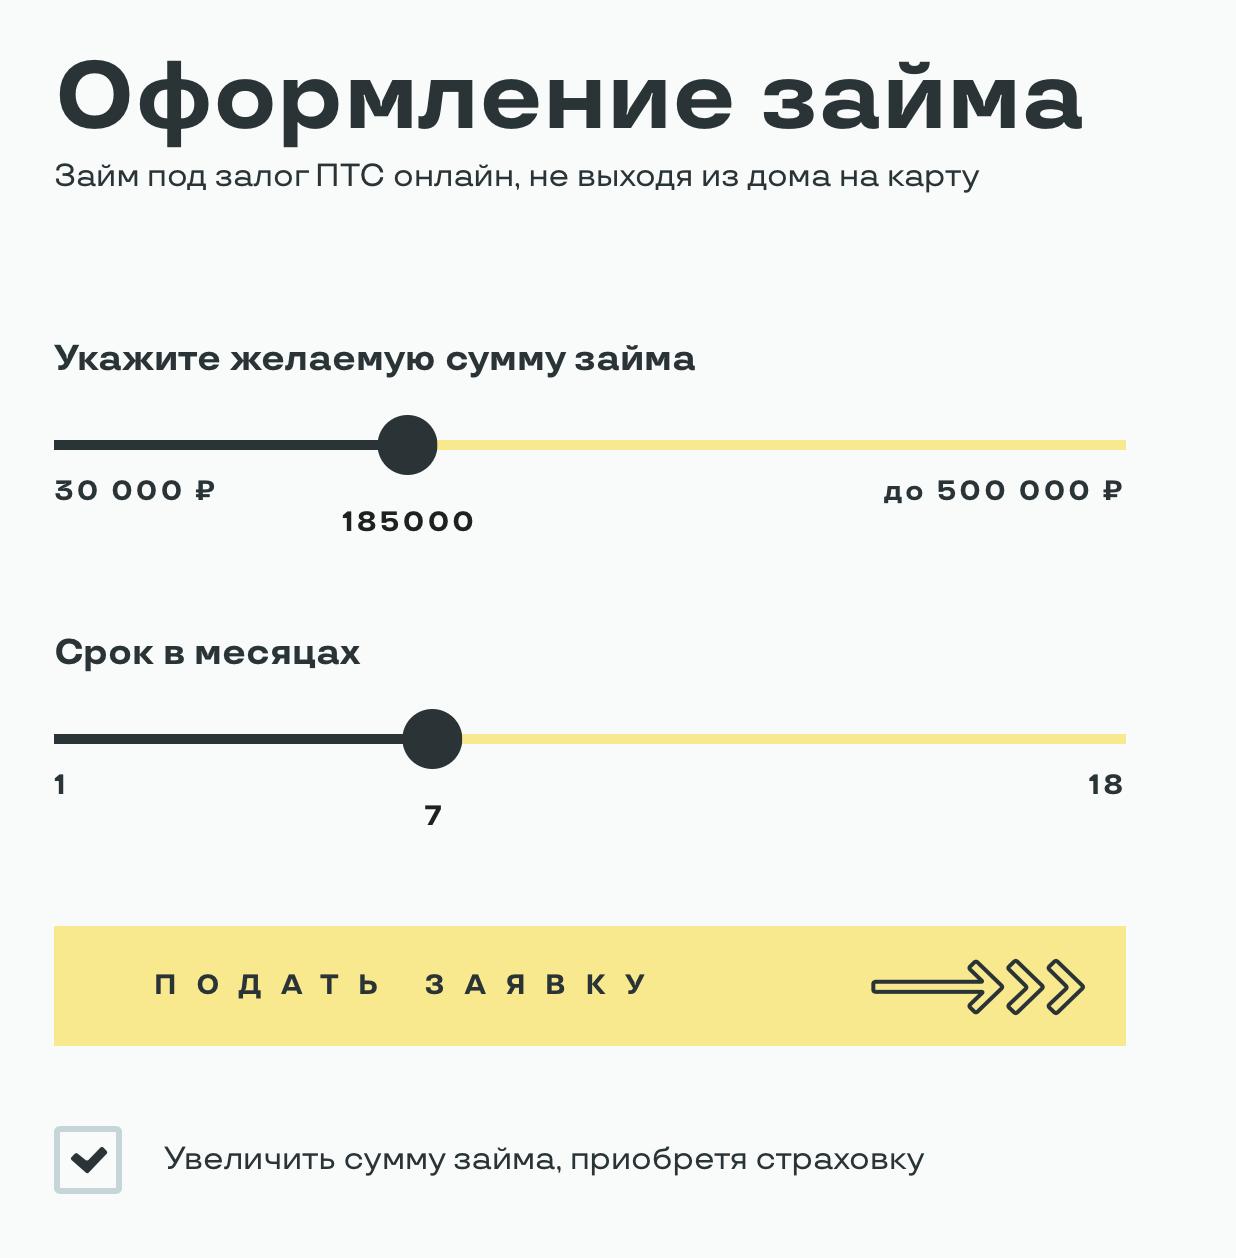 карта метро москвы схема с расчетом времени